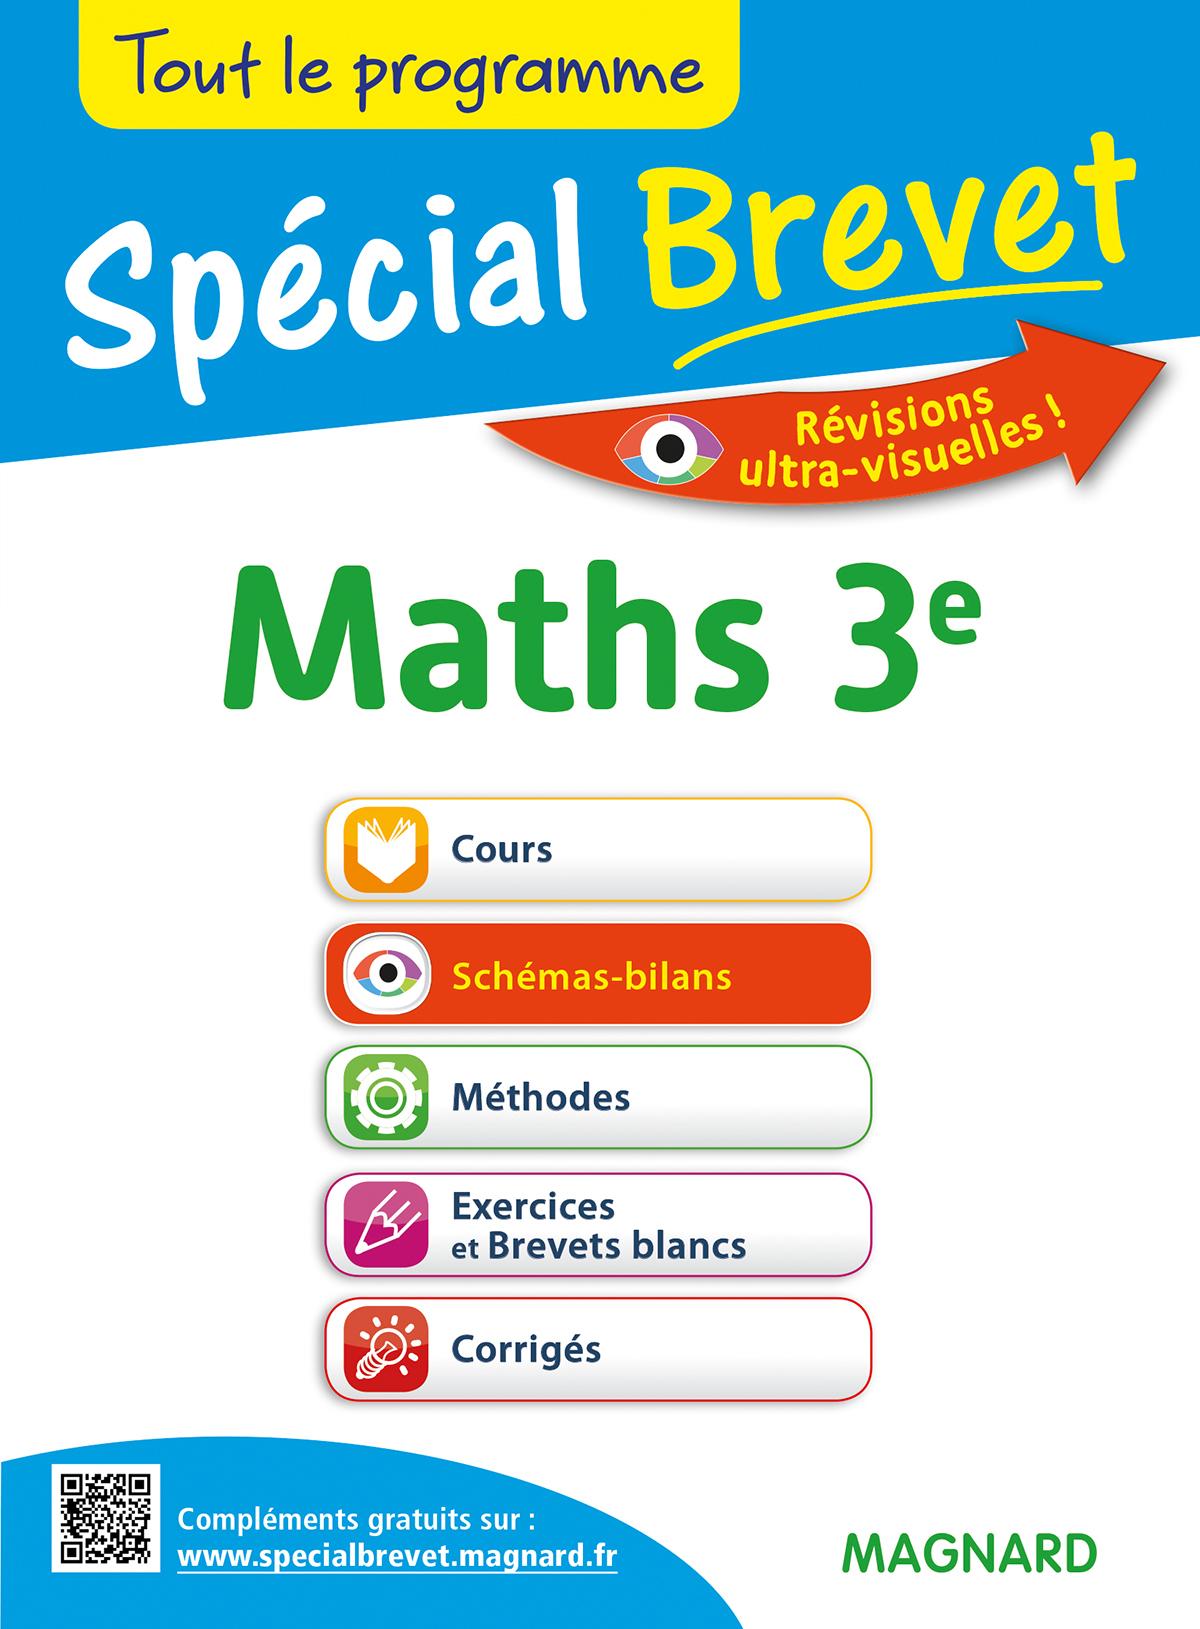 SPECIAL BREVET MATHS 3E